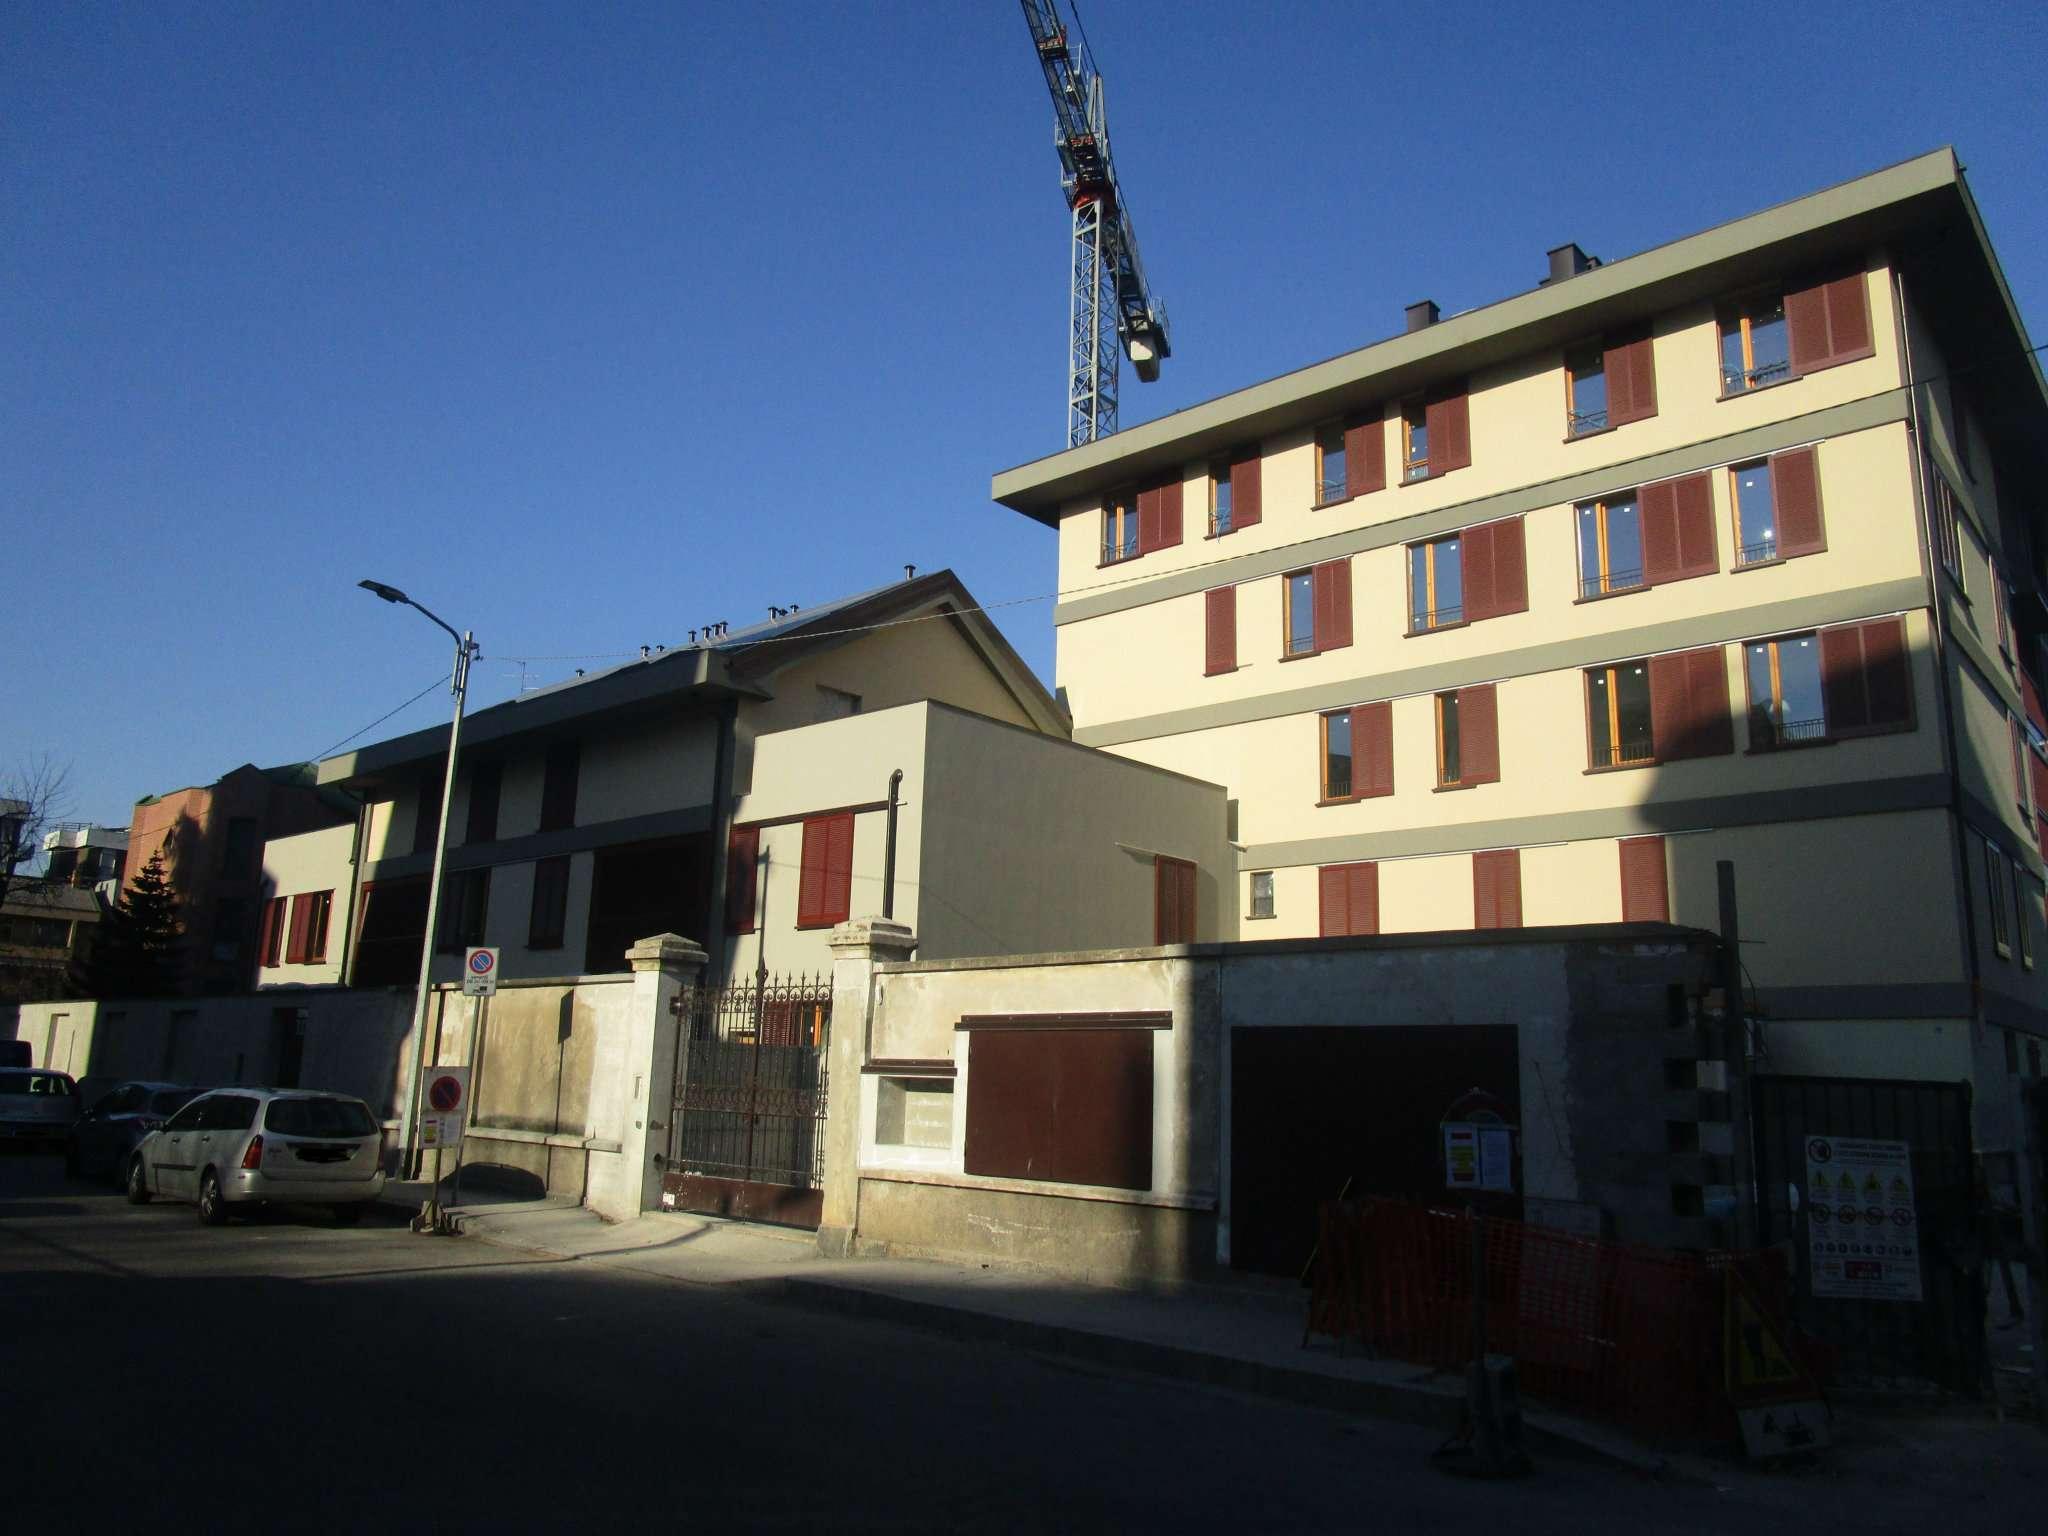 Bilocale Monza Via Oslavia 1